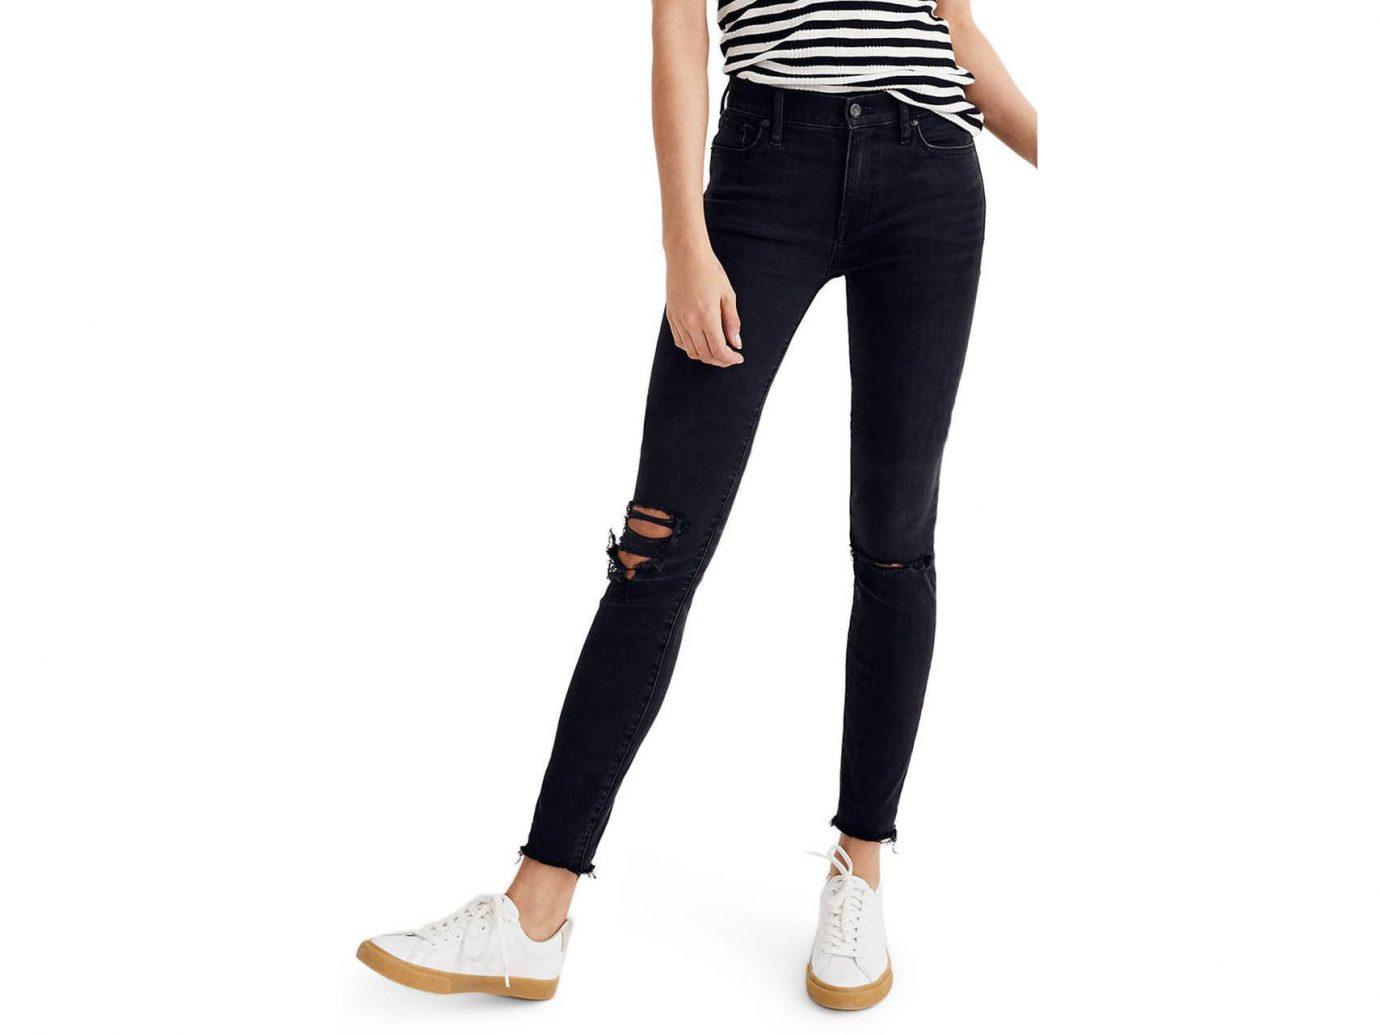 City NYC Style + Design Travel Shop clothing person jeans trouser denim waist standing joint posing leggings trousers leg human leg shoe tights abdomen pocket